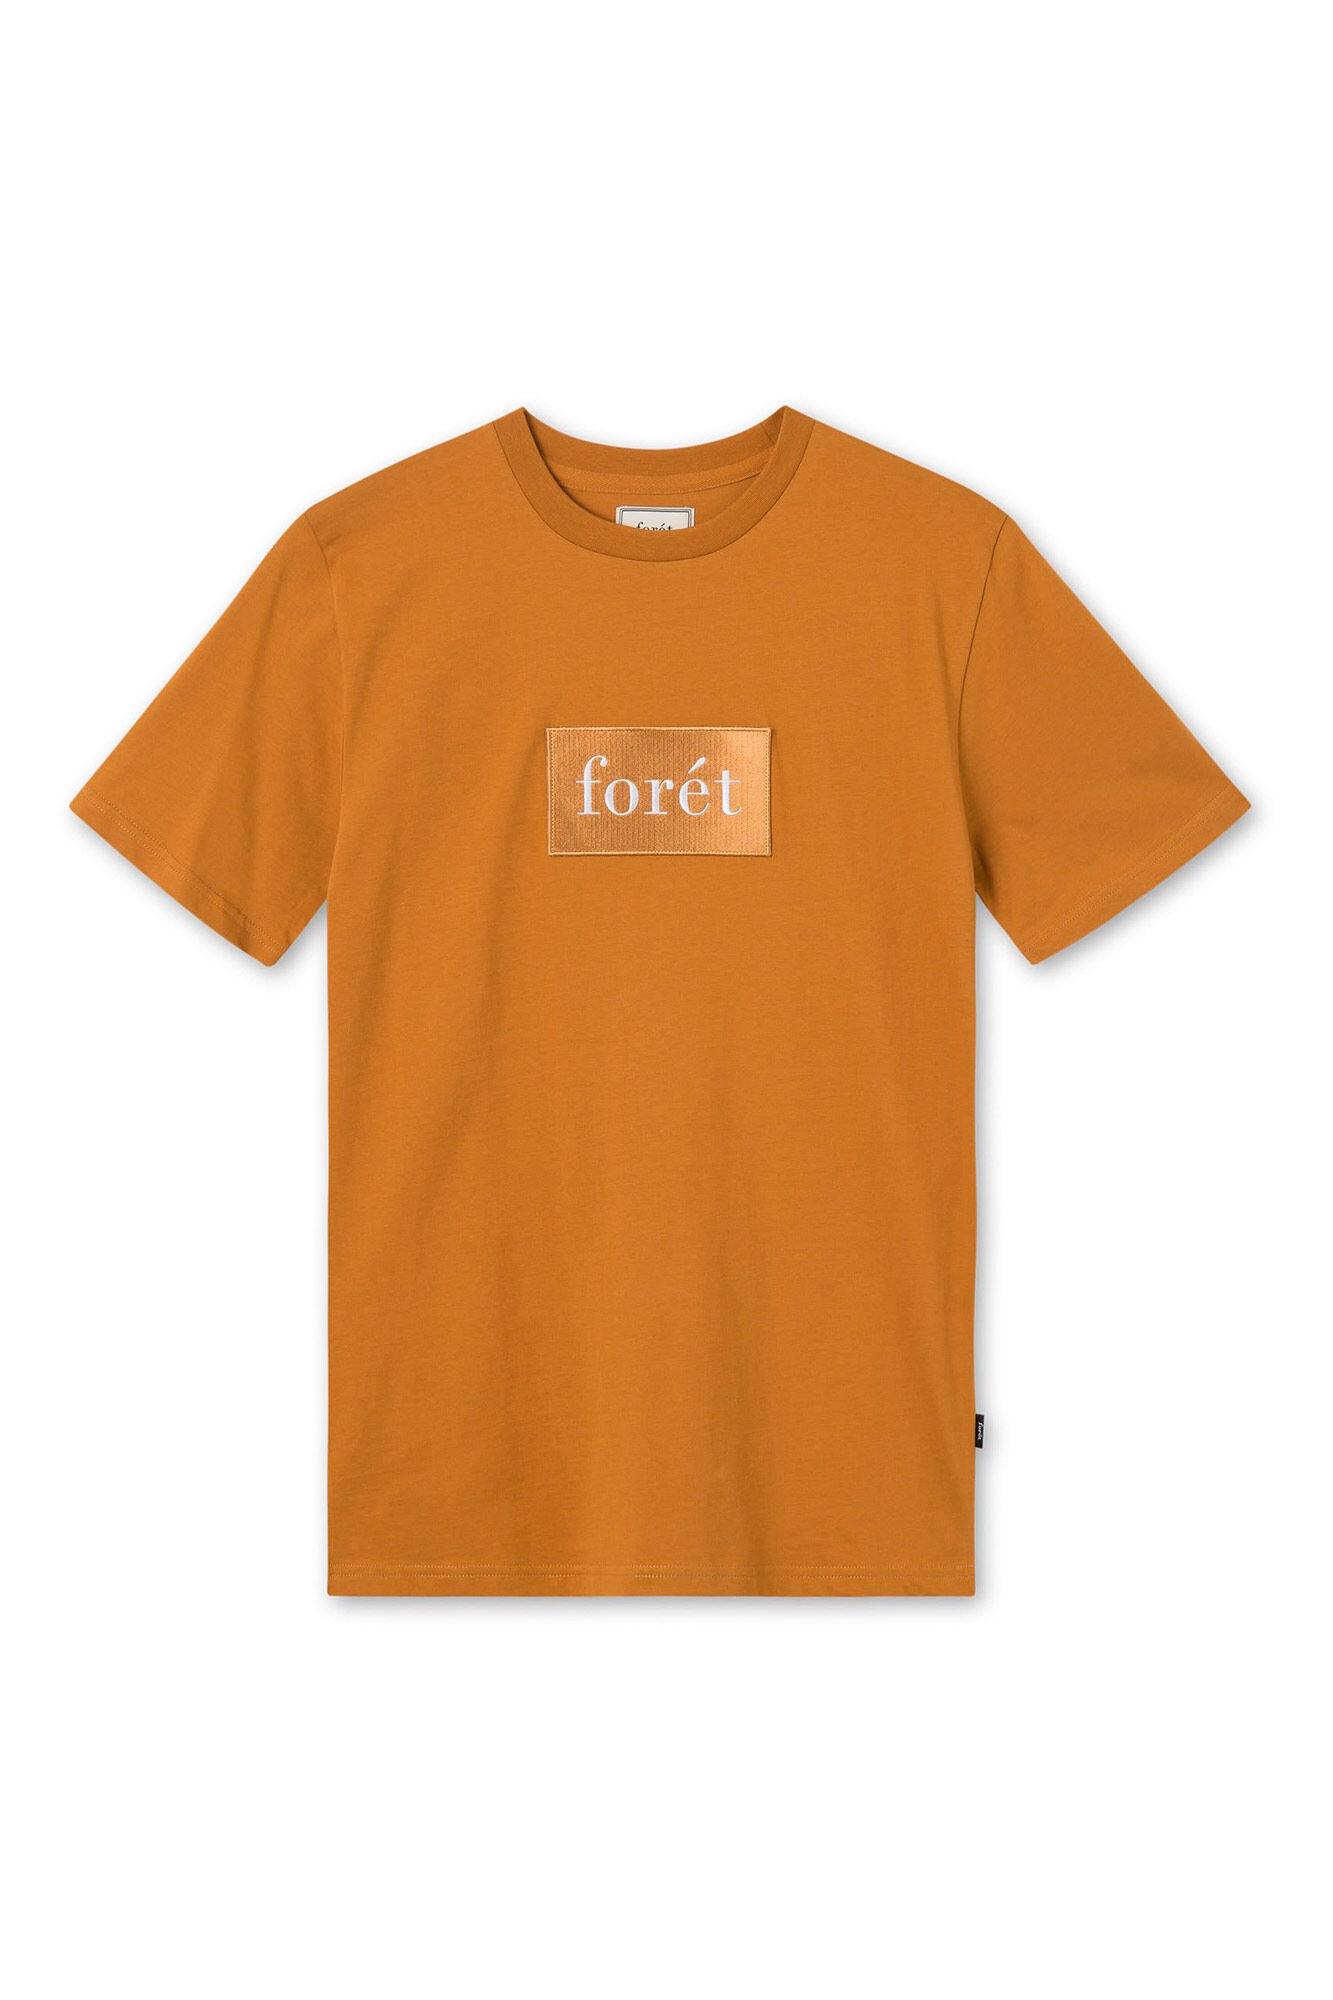 Reef t-shirt 605, TAN